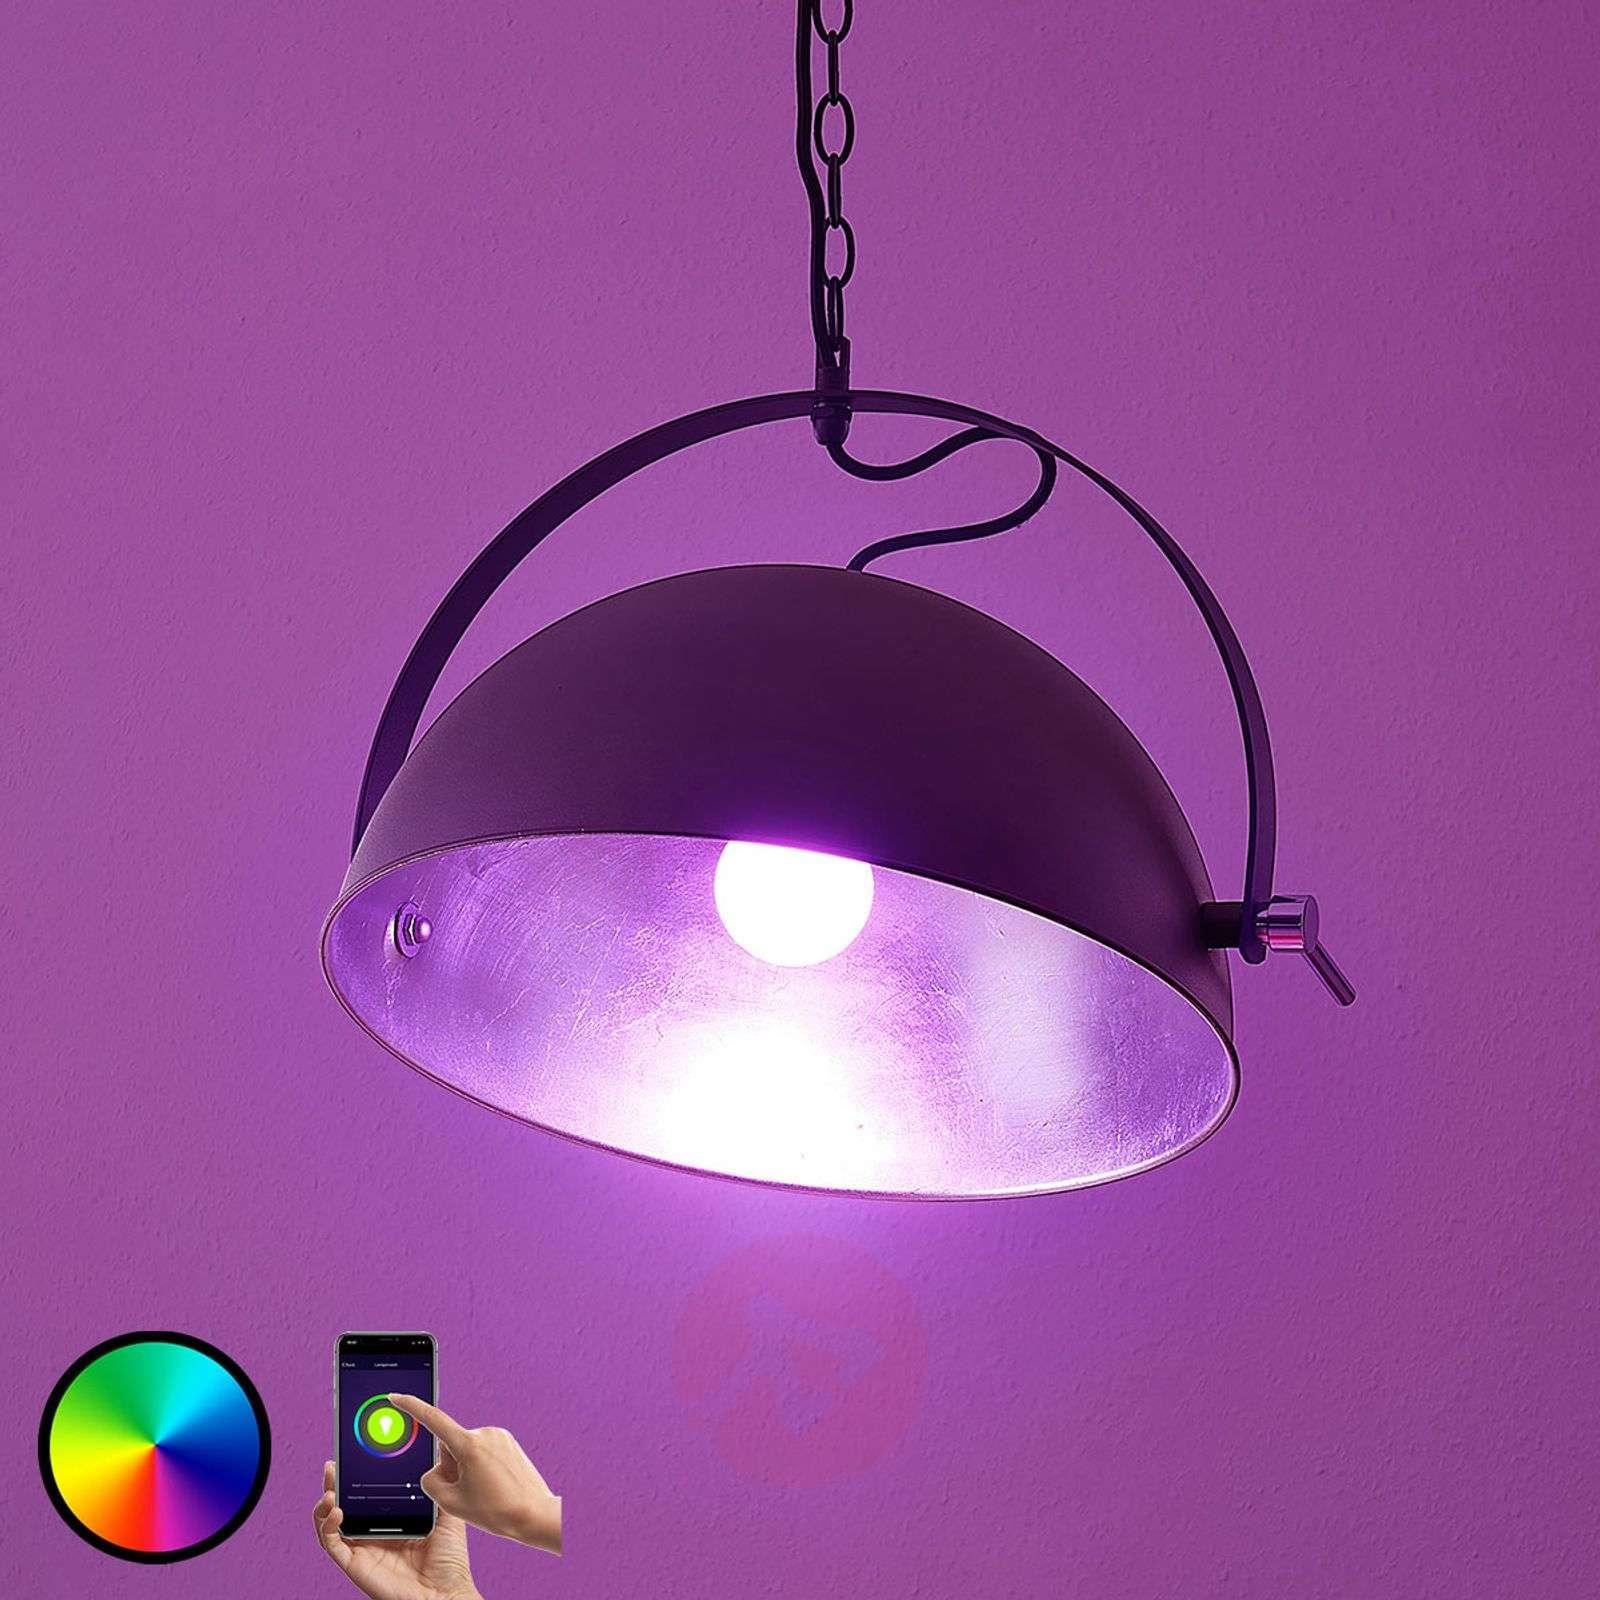 Lindby Smart LED-riippuvalaisin Muriel, hopea-9624233-02